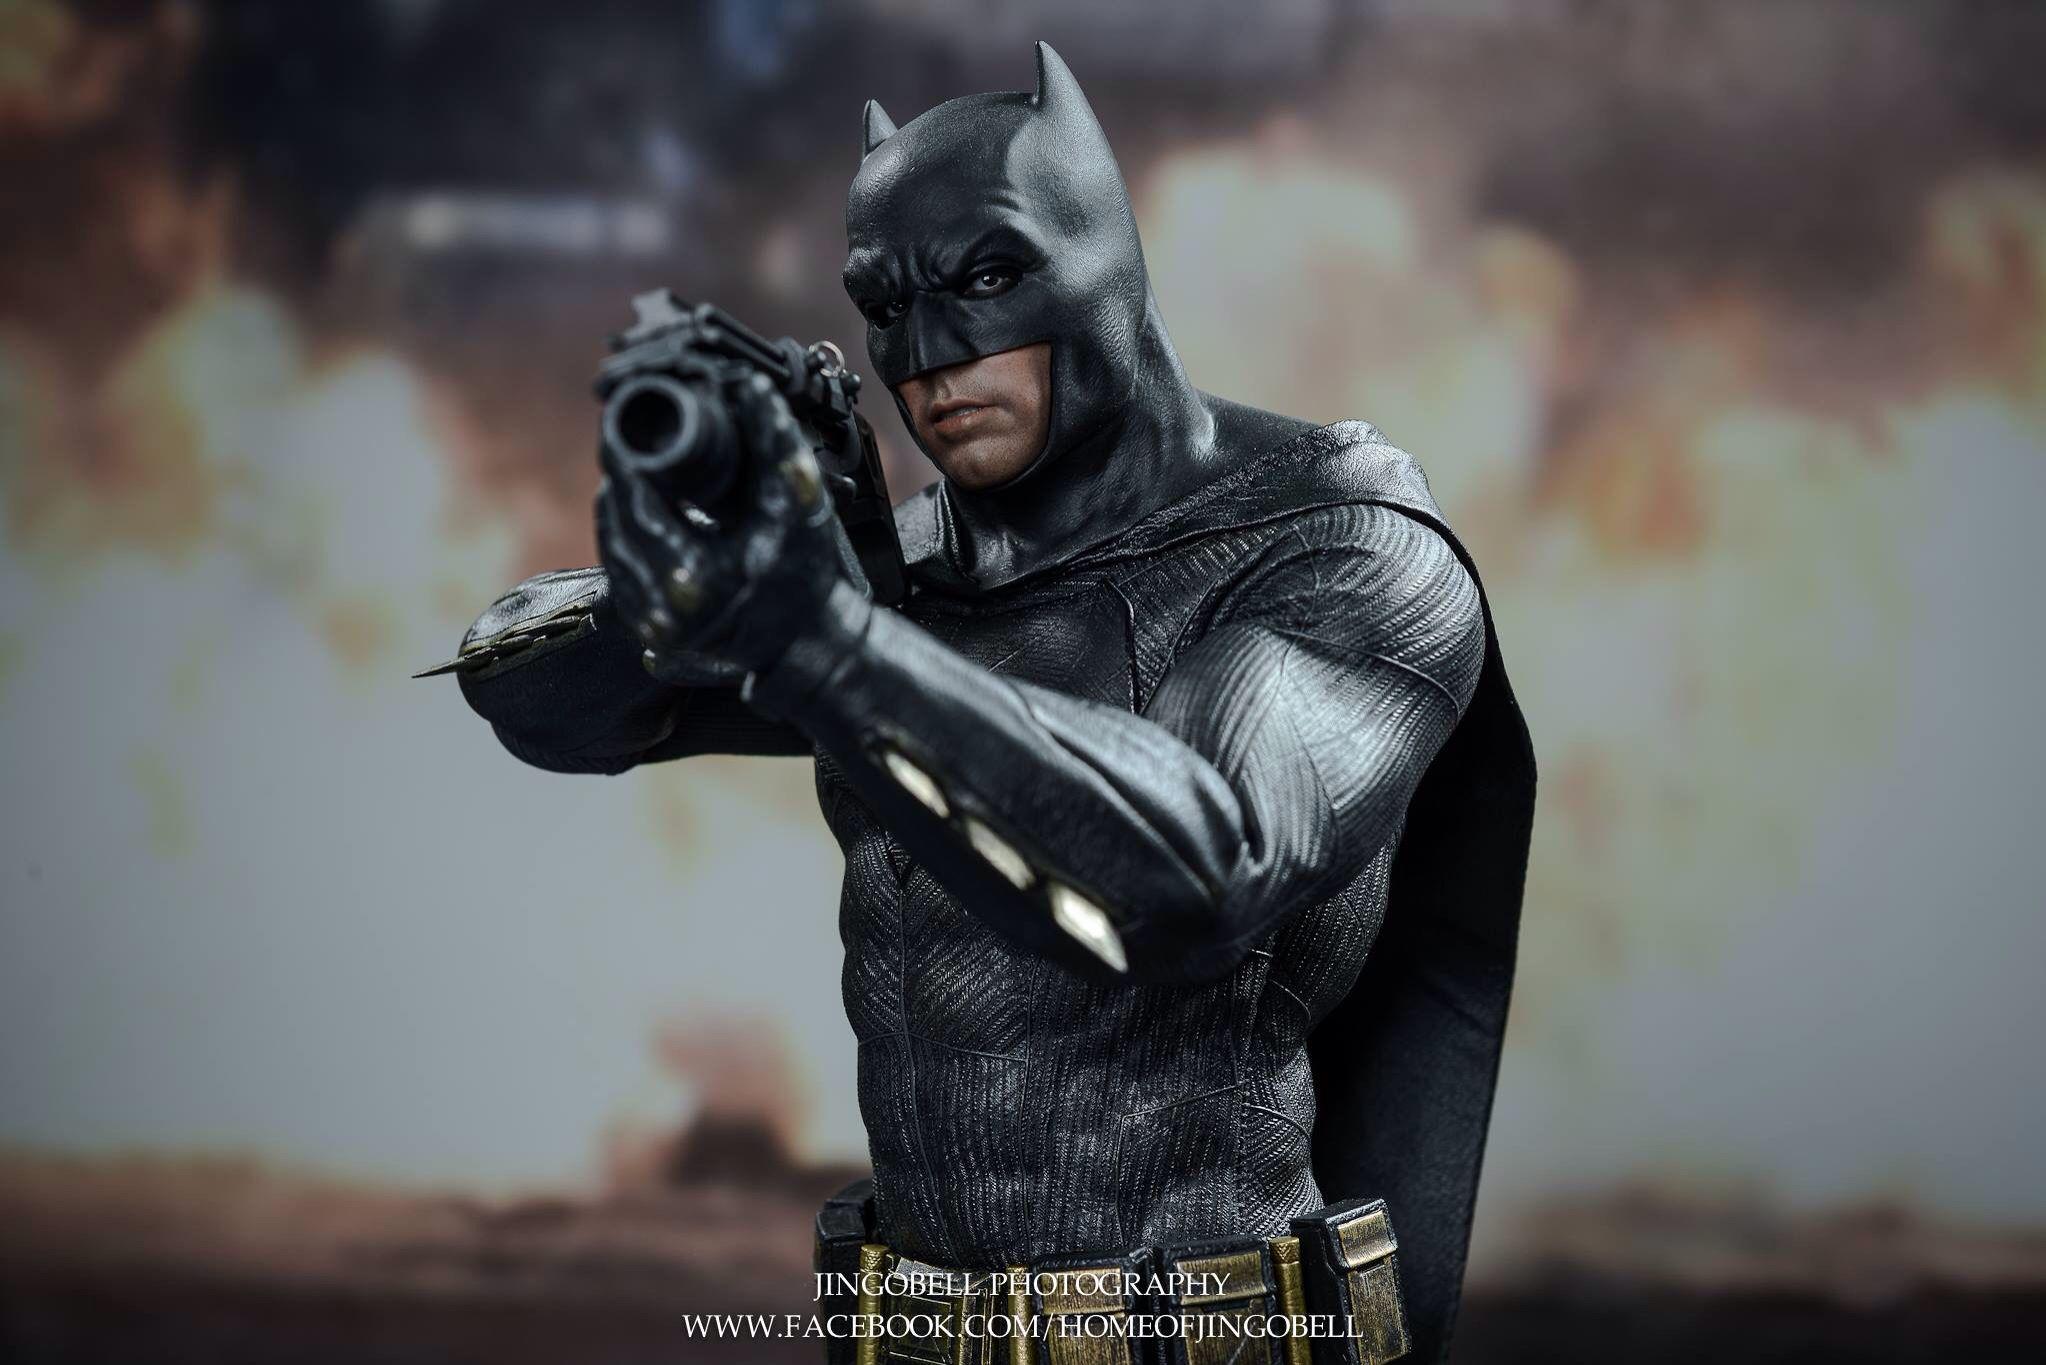 The Bat of Gotham is here!  The Batman v Superman: Dawn of Justice 1/6th scale Batman collectible figure's final product has arrived.  #Batman #Superman #BatmanVSuperman #DawnOfJustice